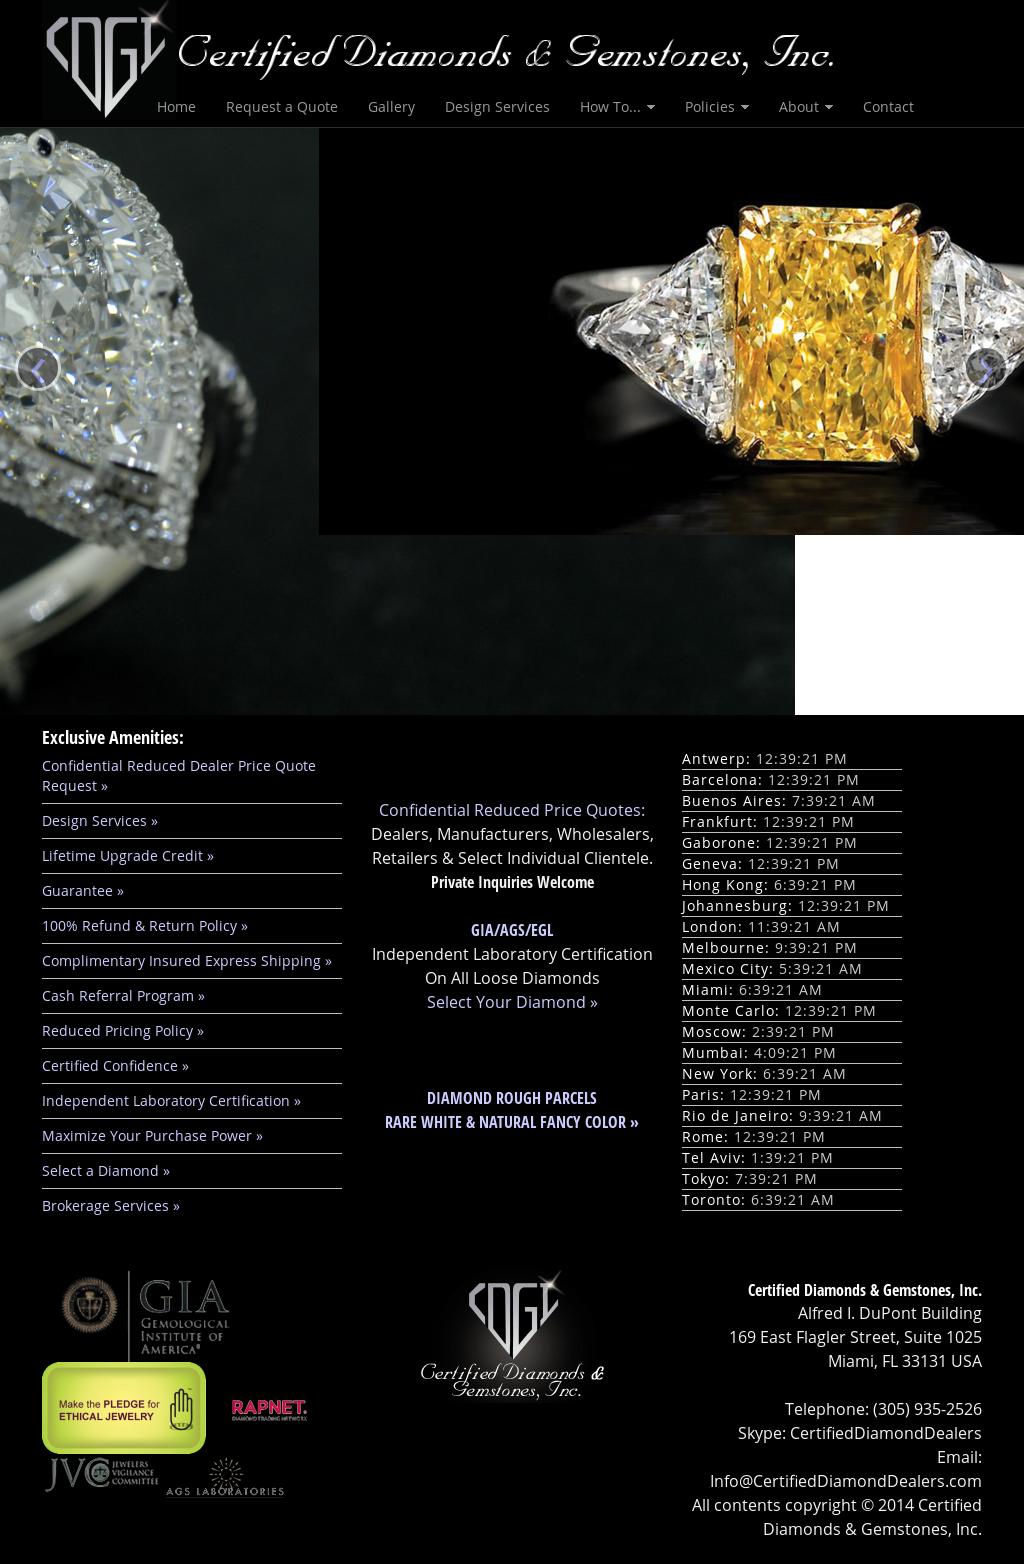 Certified Diamonds & Gemstones Competitors, Revenue and